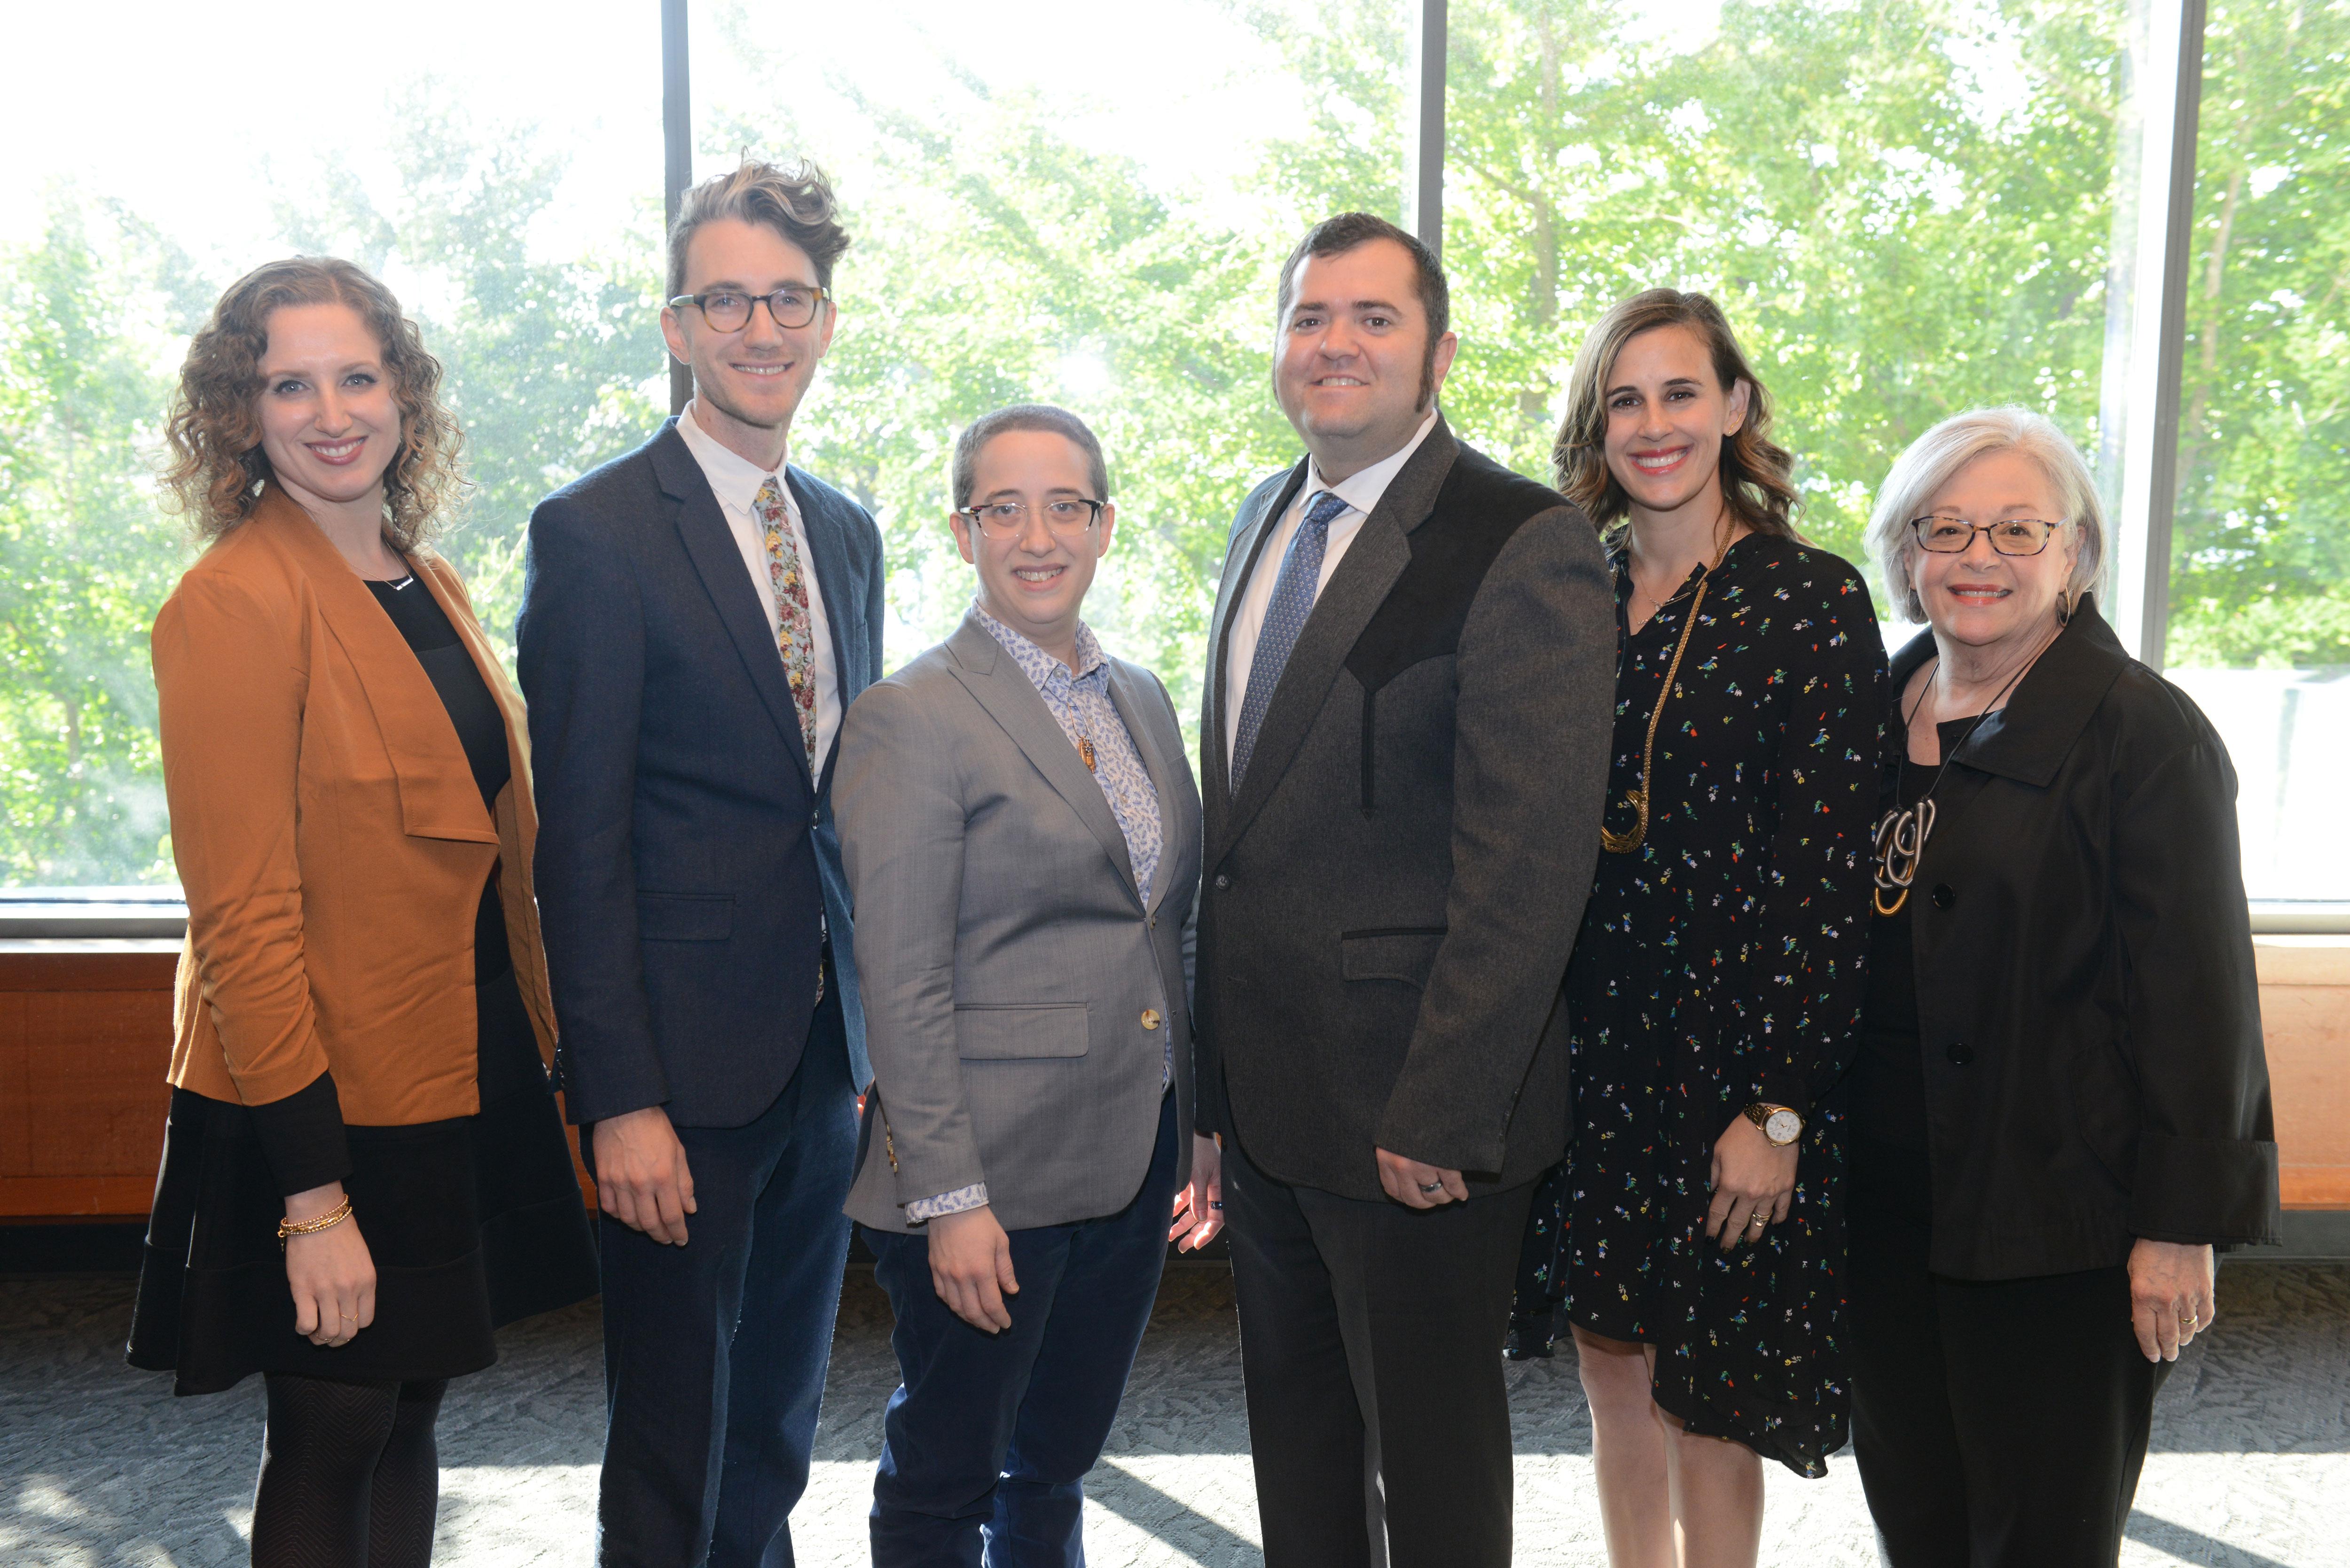 2019 Pomegranate Prize Awarded to Five Emerging Jewish Educators